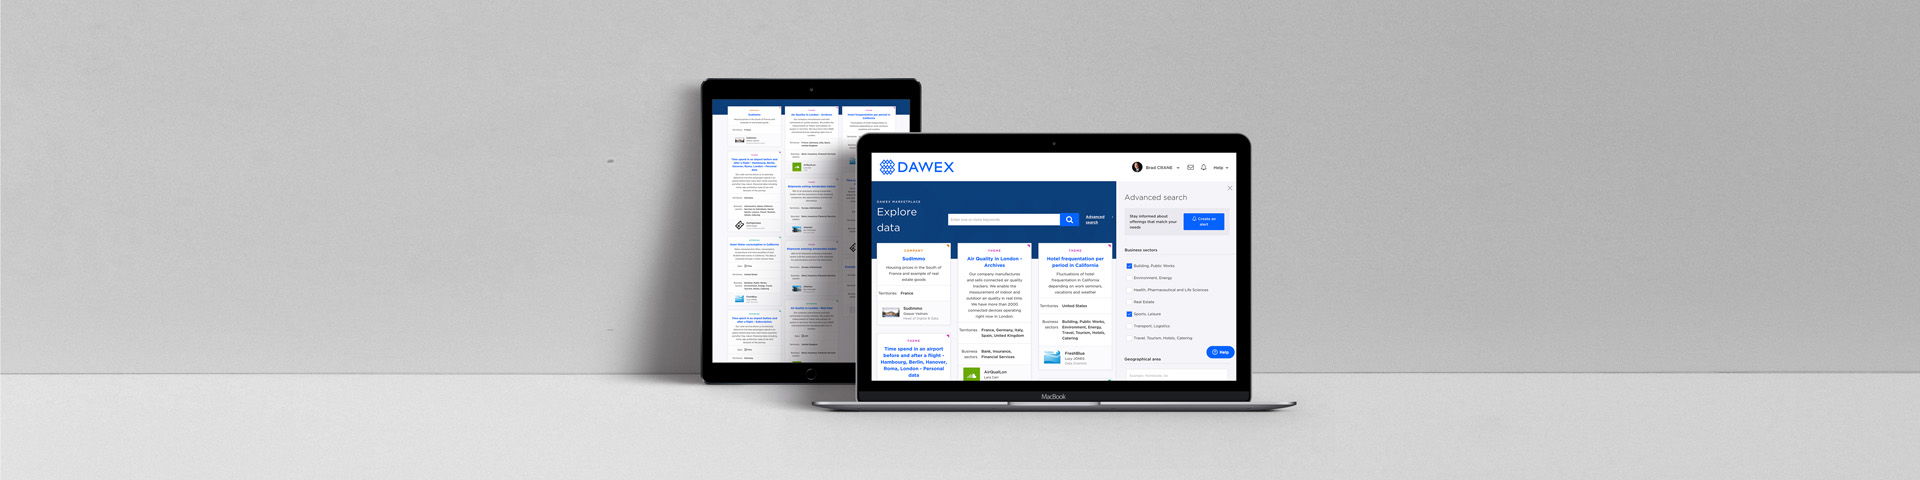 Searching on Dawex